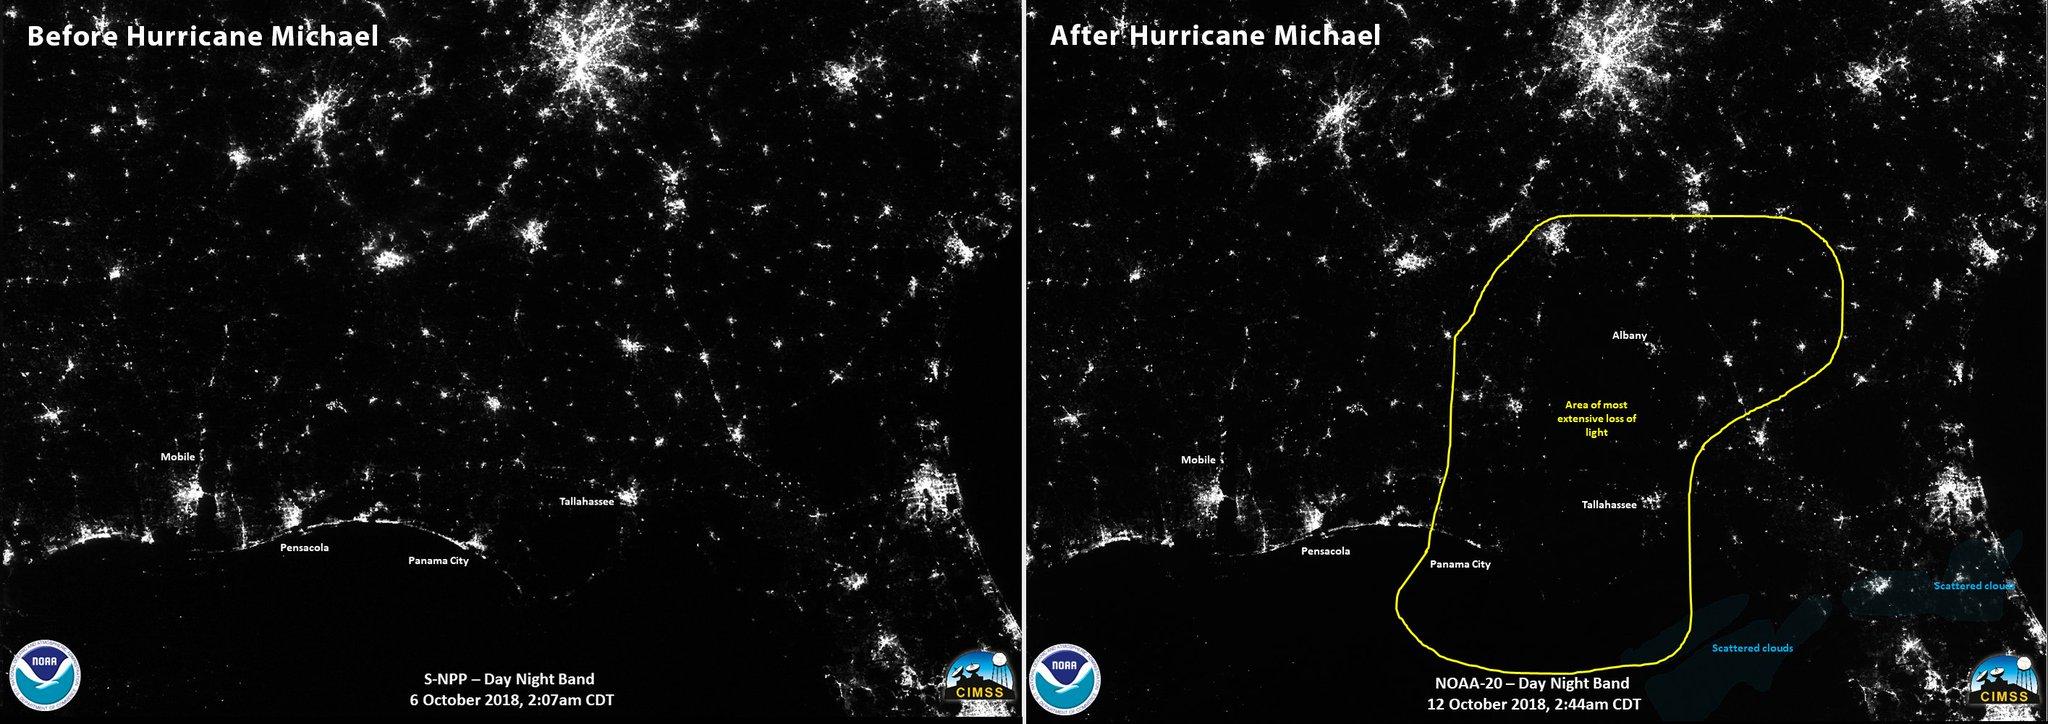 Gromovnik Iknar vs Amerika: Uragan Mihael otpuhao Floridu - Page 2 DpT_yomWwAEmo6z